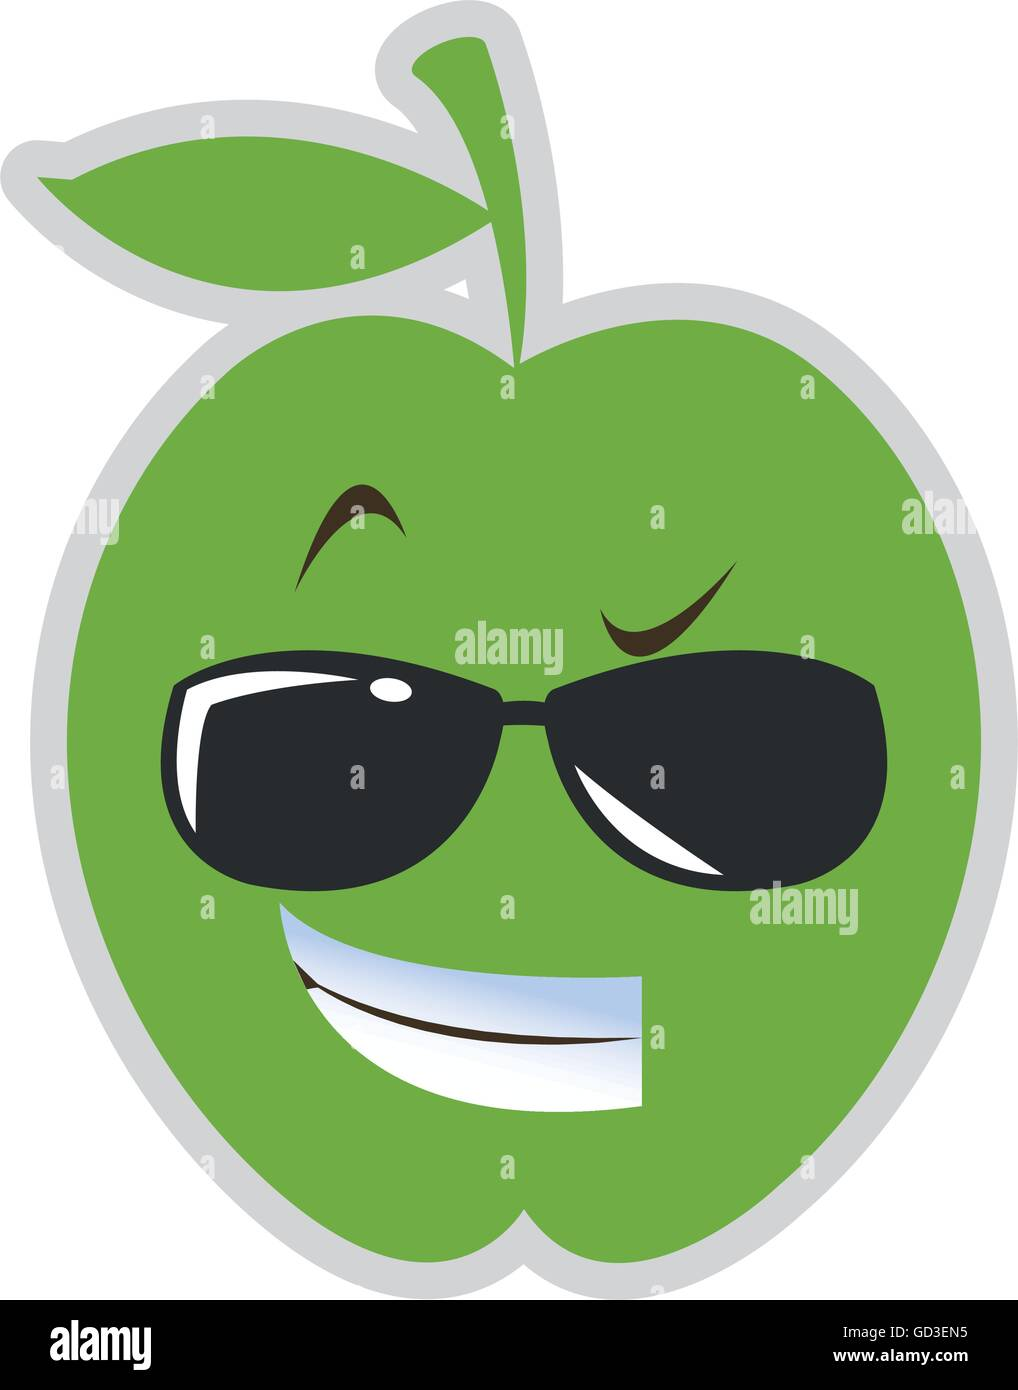 38934cbdfab60 cool sunglasses apple cartoon icon Stock Vector Art   Illustration ...